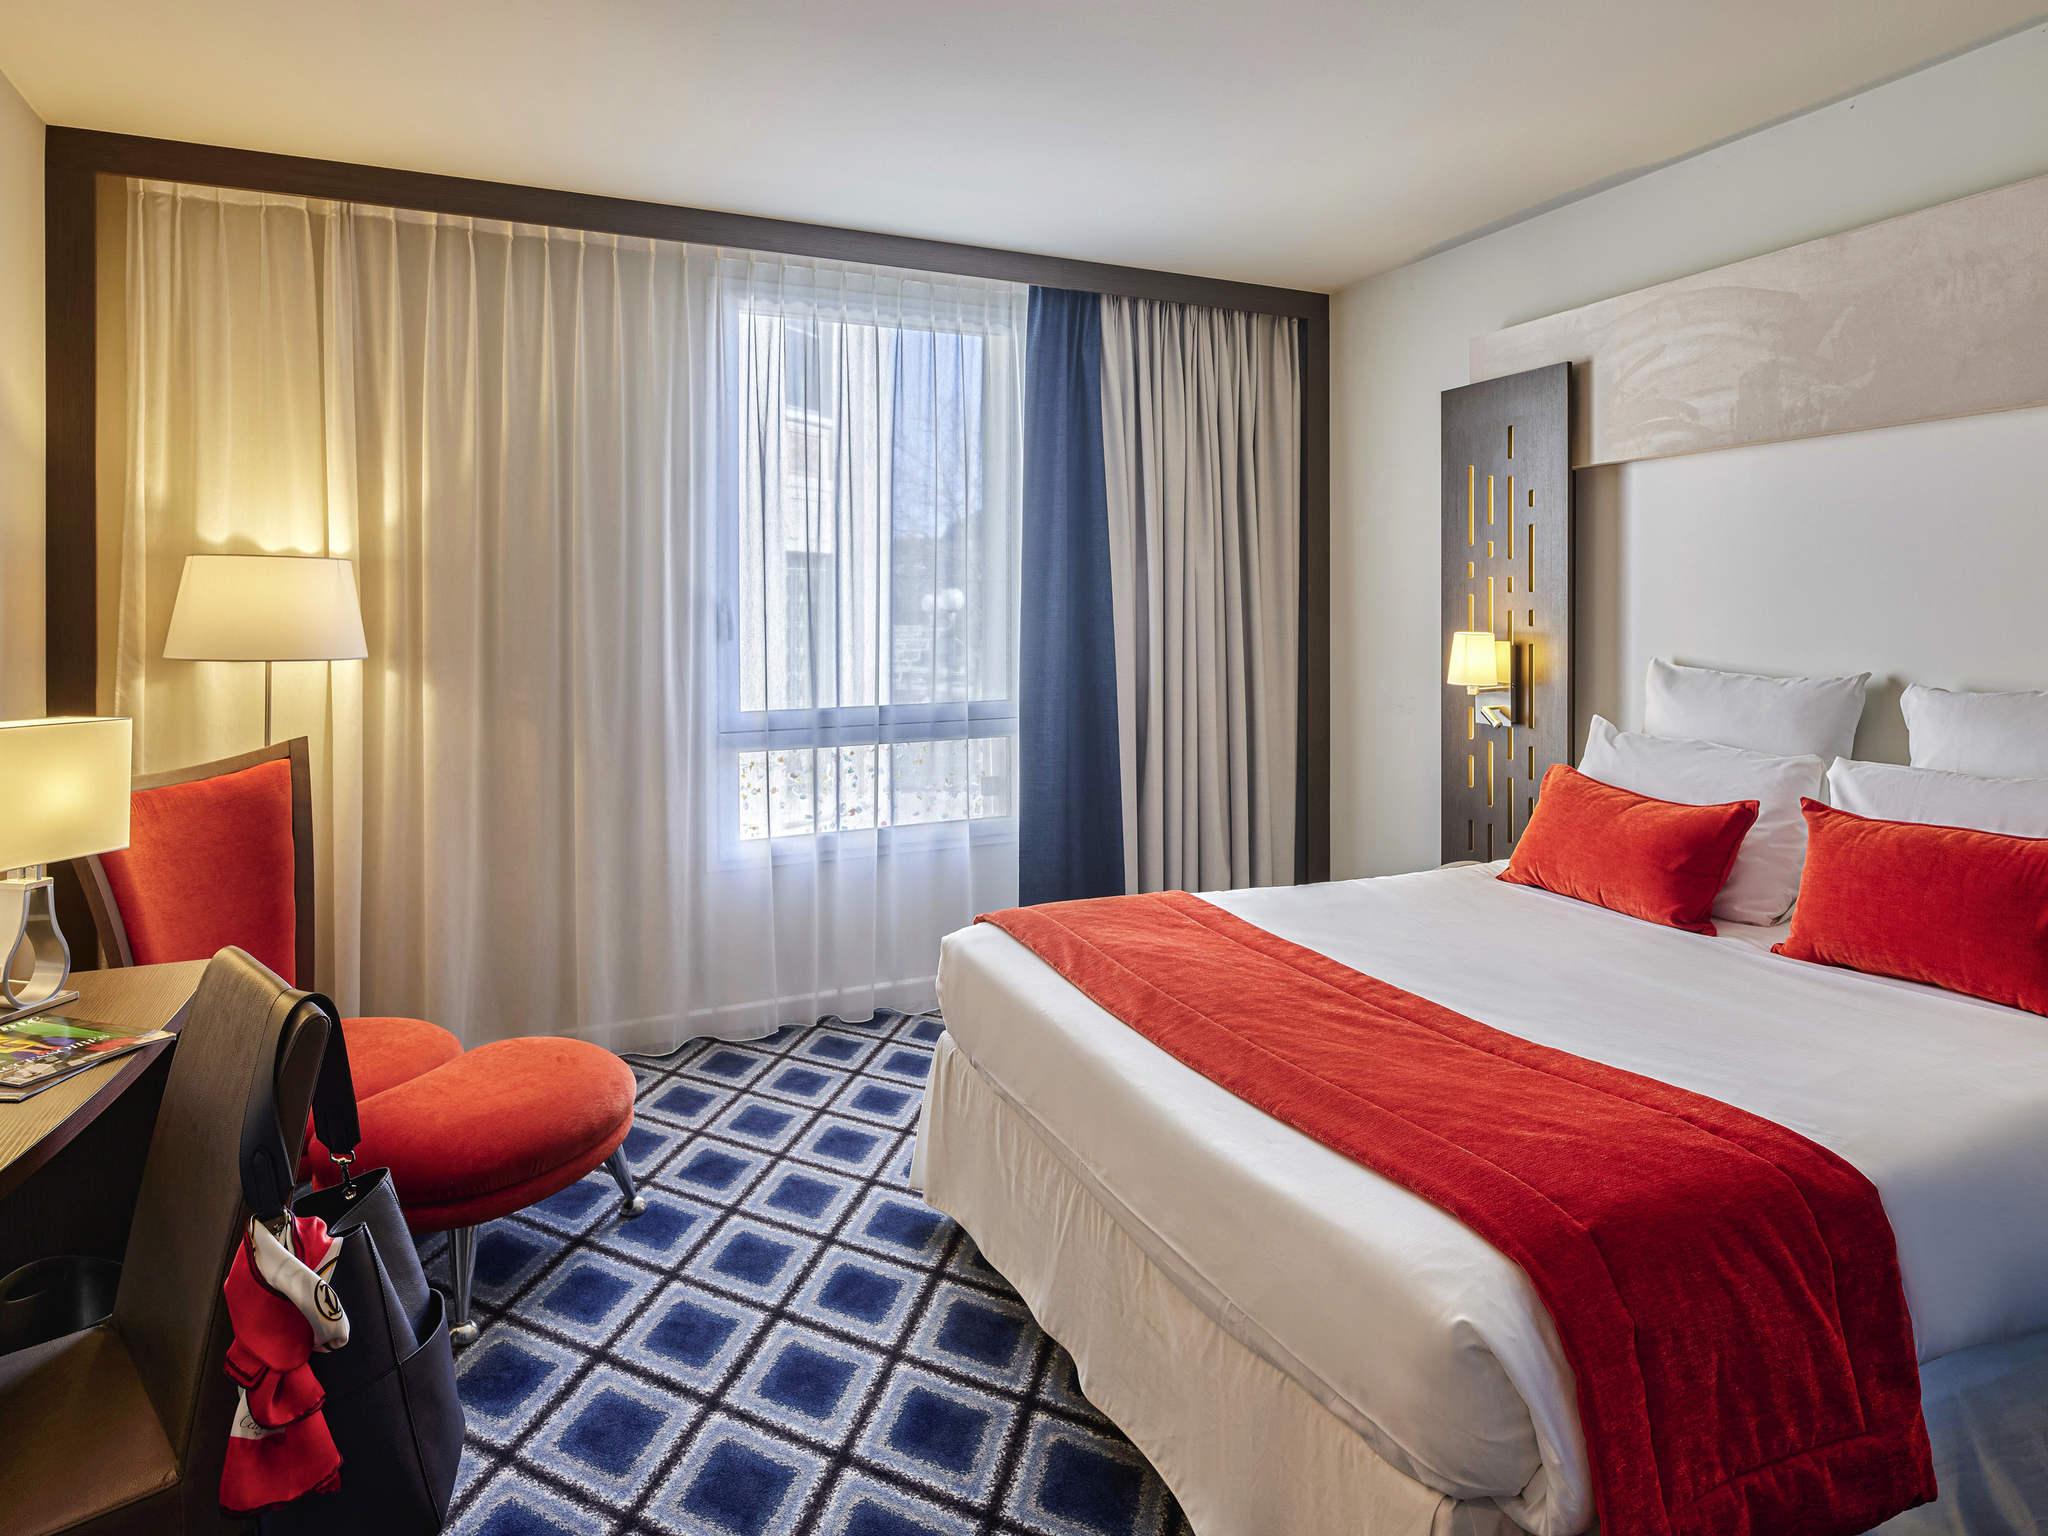 Hotel – Mercure Chartres Centre Cathédrale Hotel